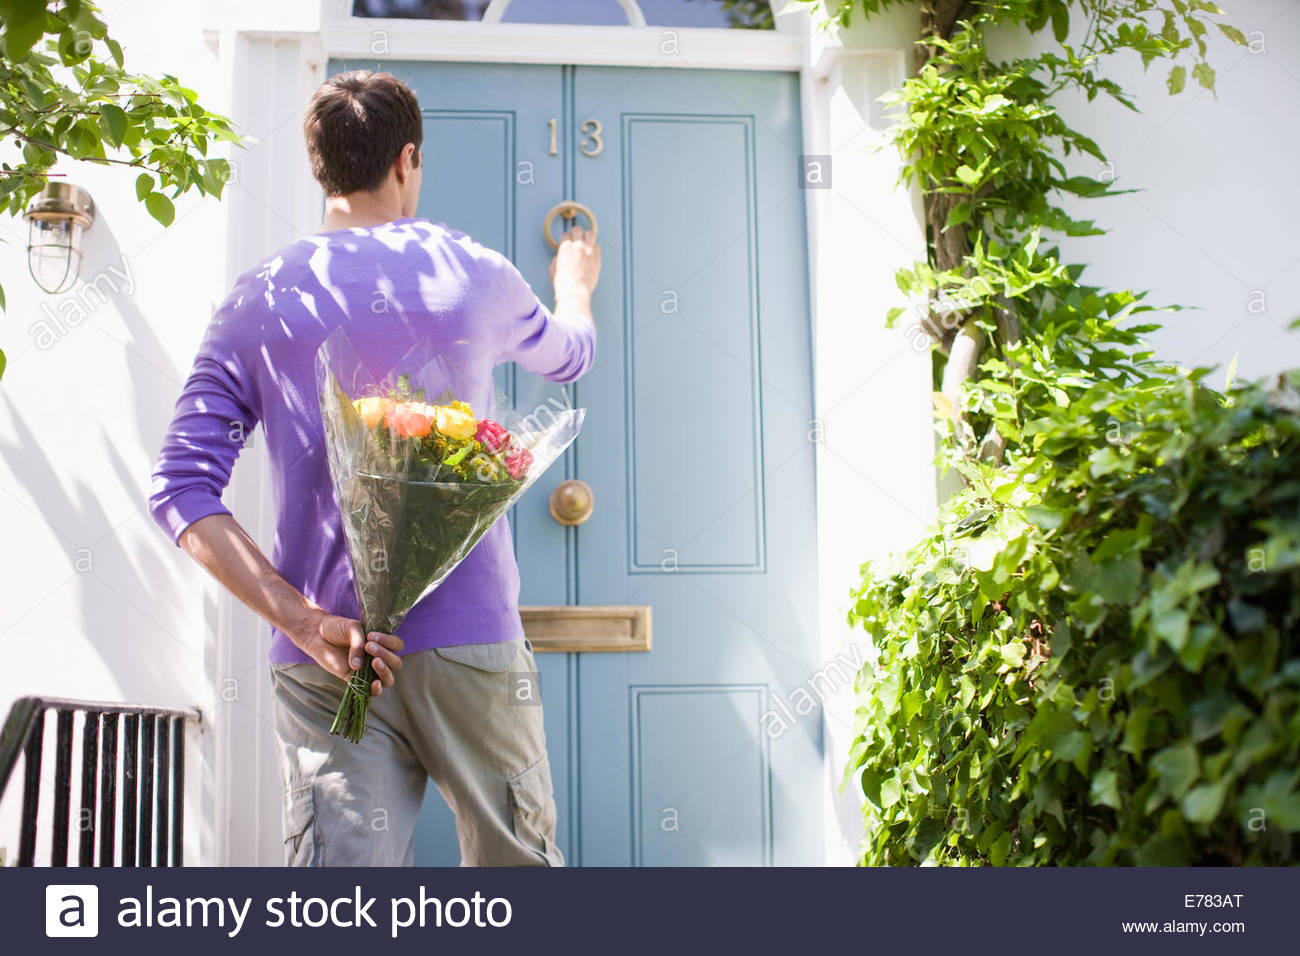 Man Holding Bouquet Flowers Knocking Stock Photos & Man Holding ...